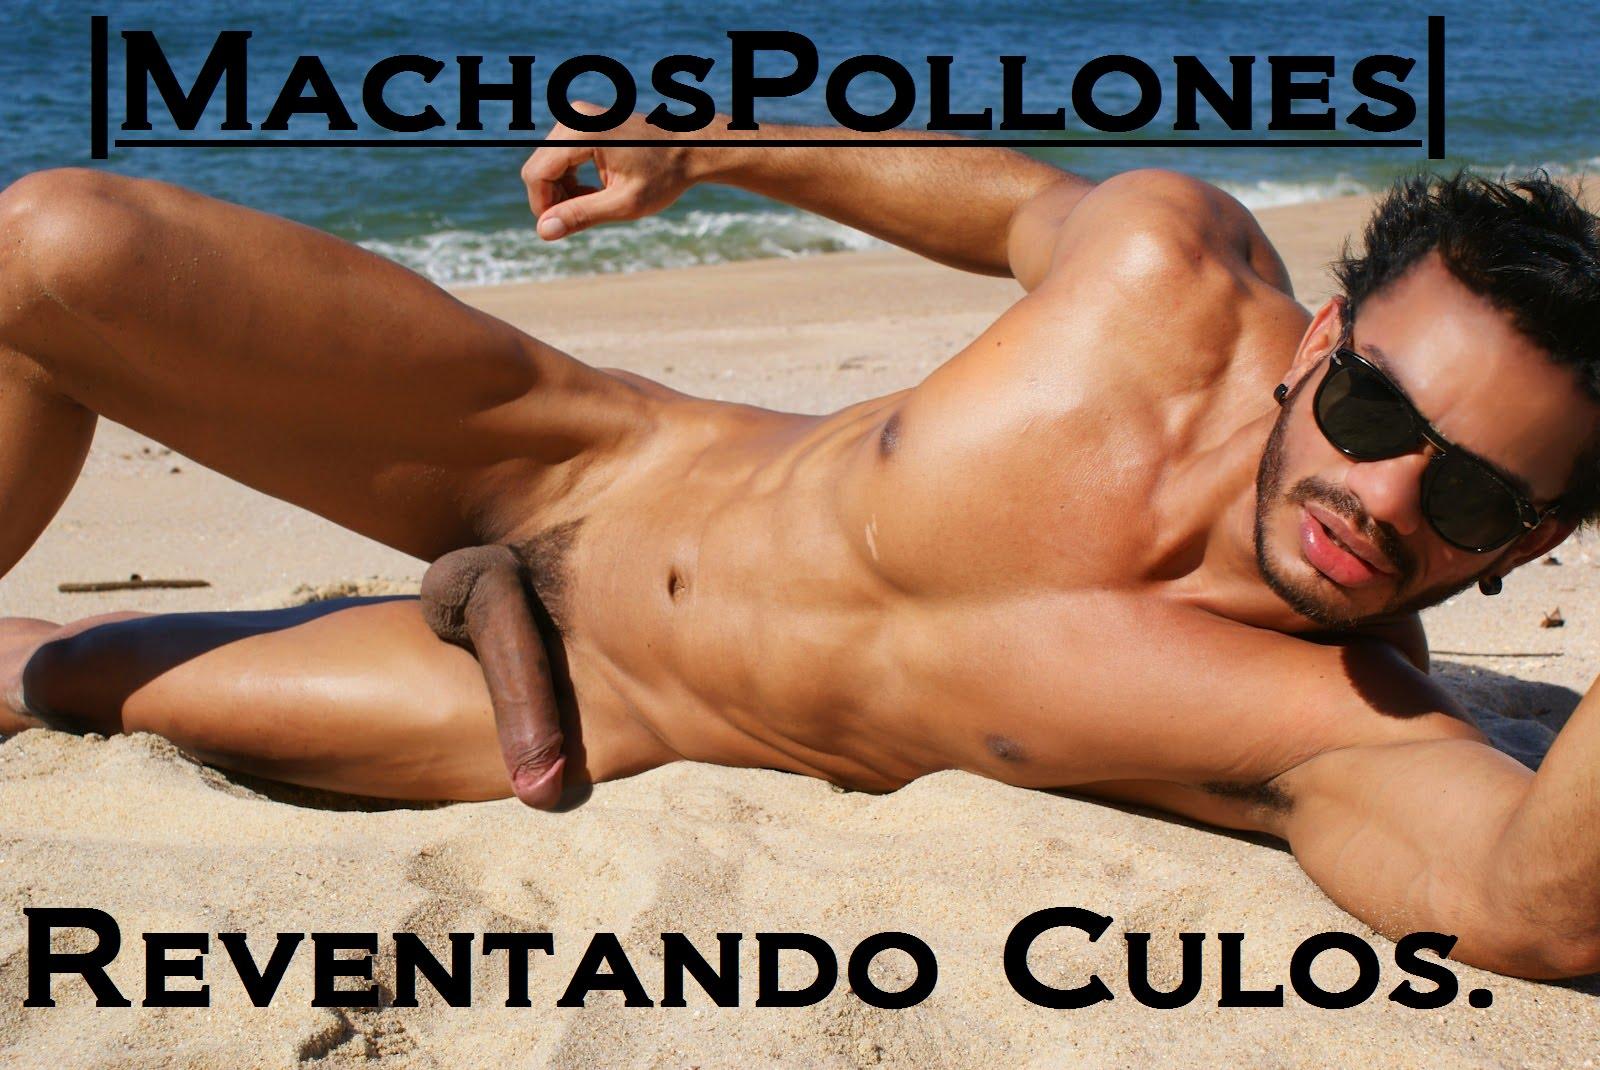 Via Machospollones Blogspot